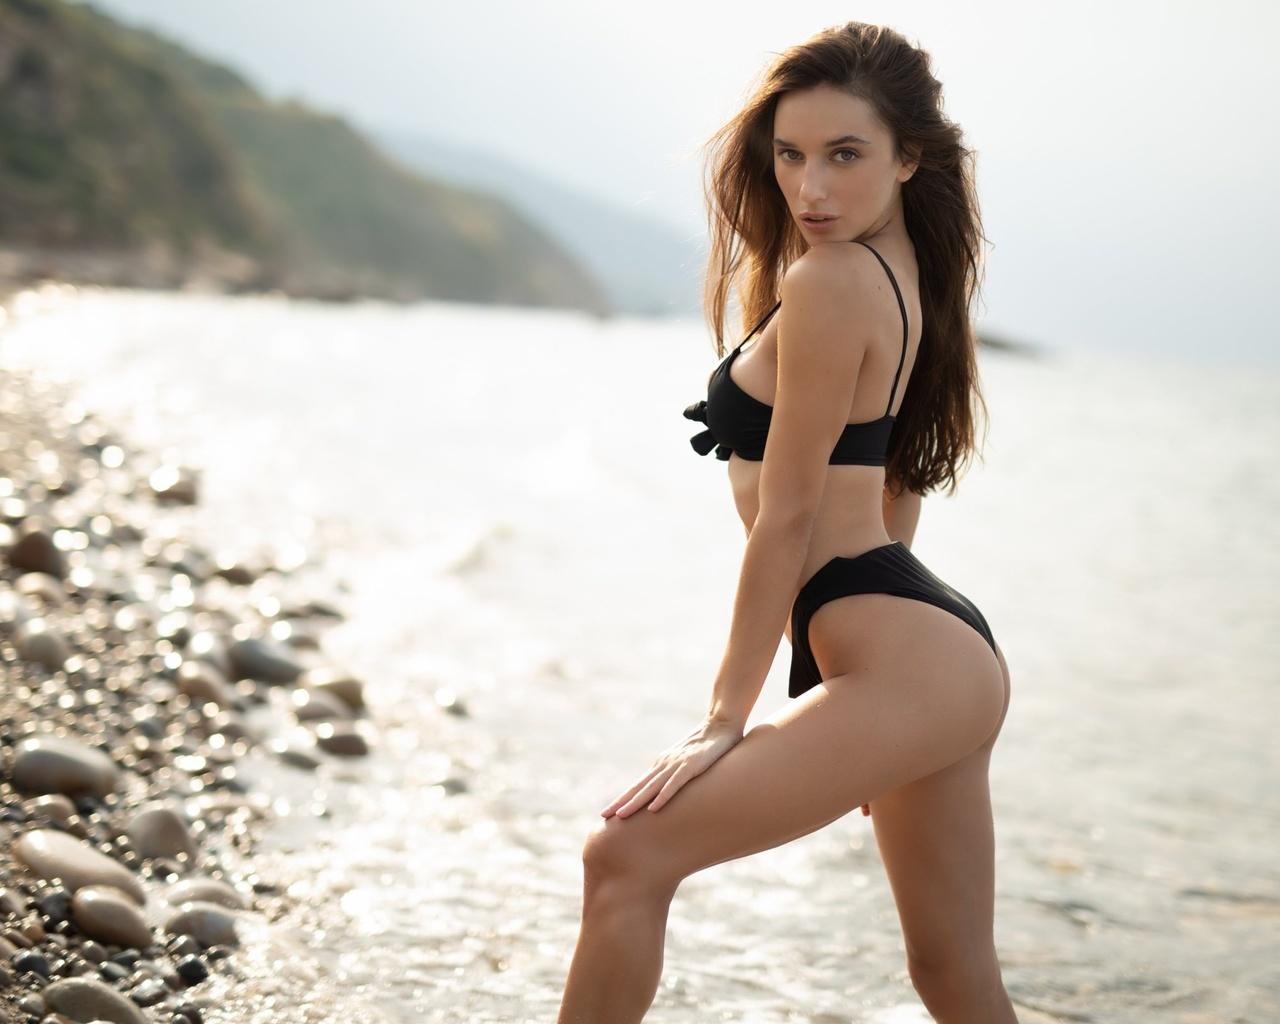 gloria sol, women, black bikini, sea, women outdoors, ass, skinny